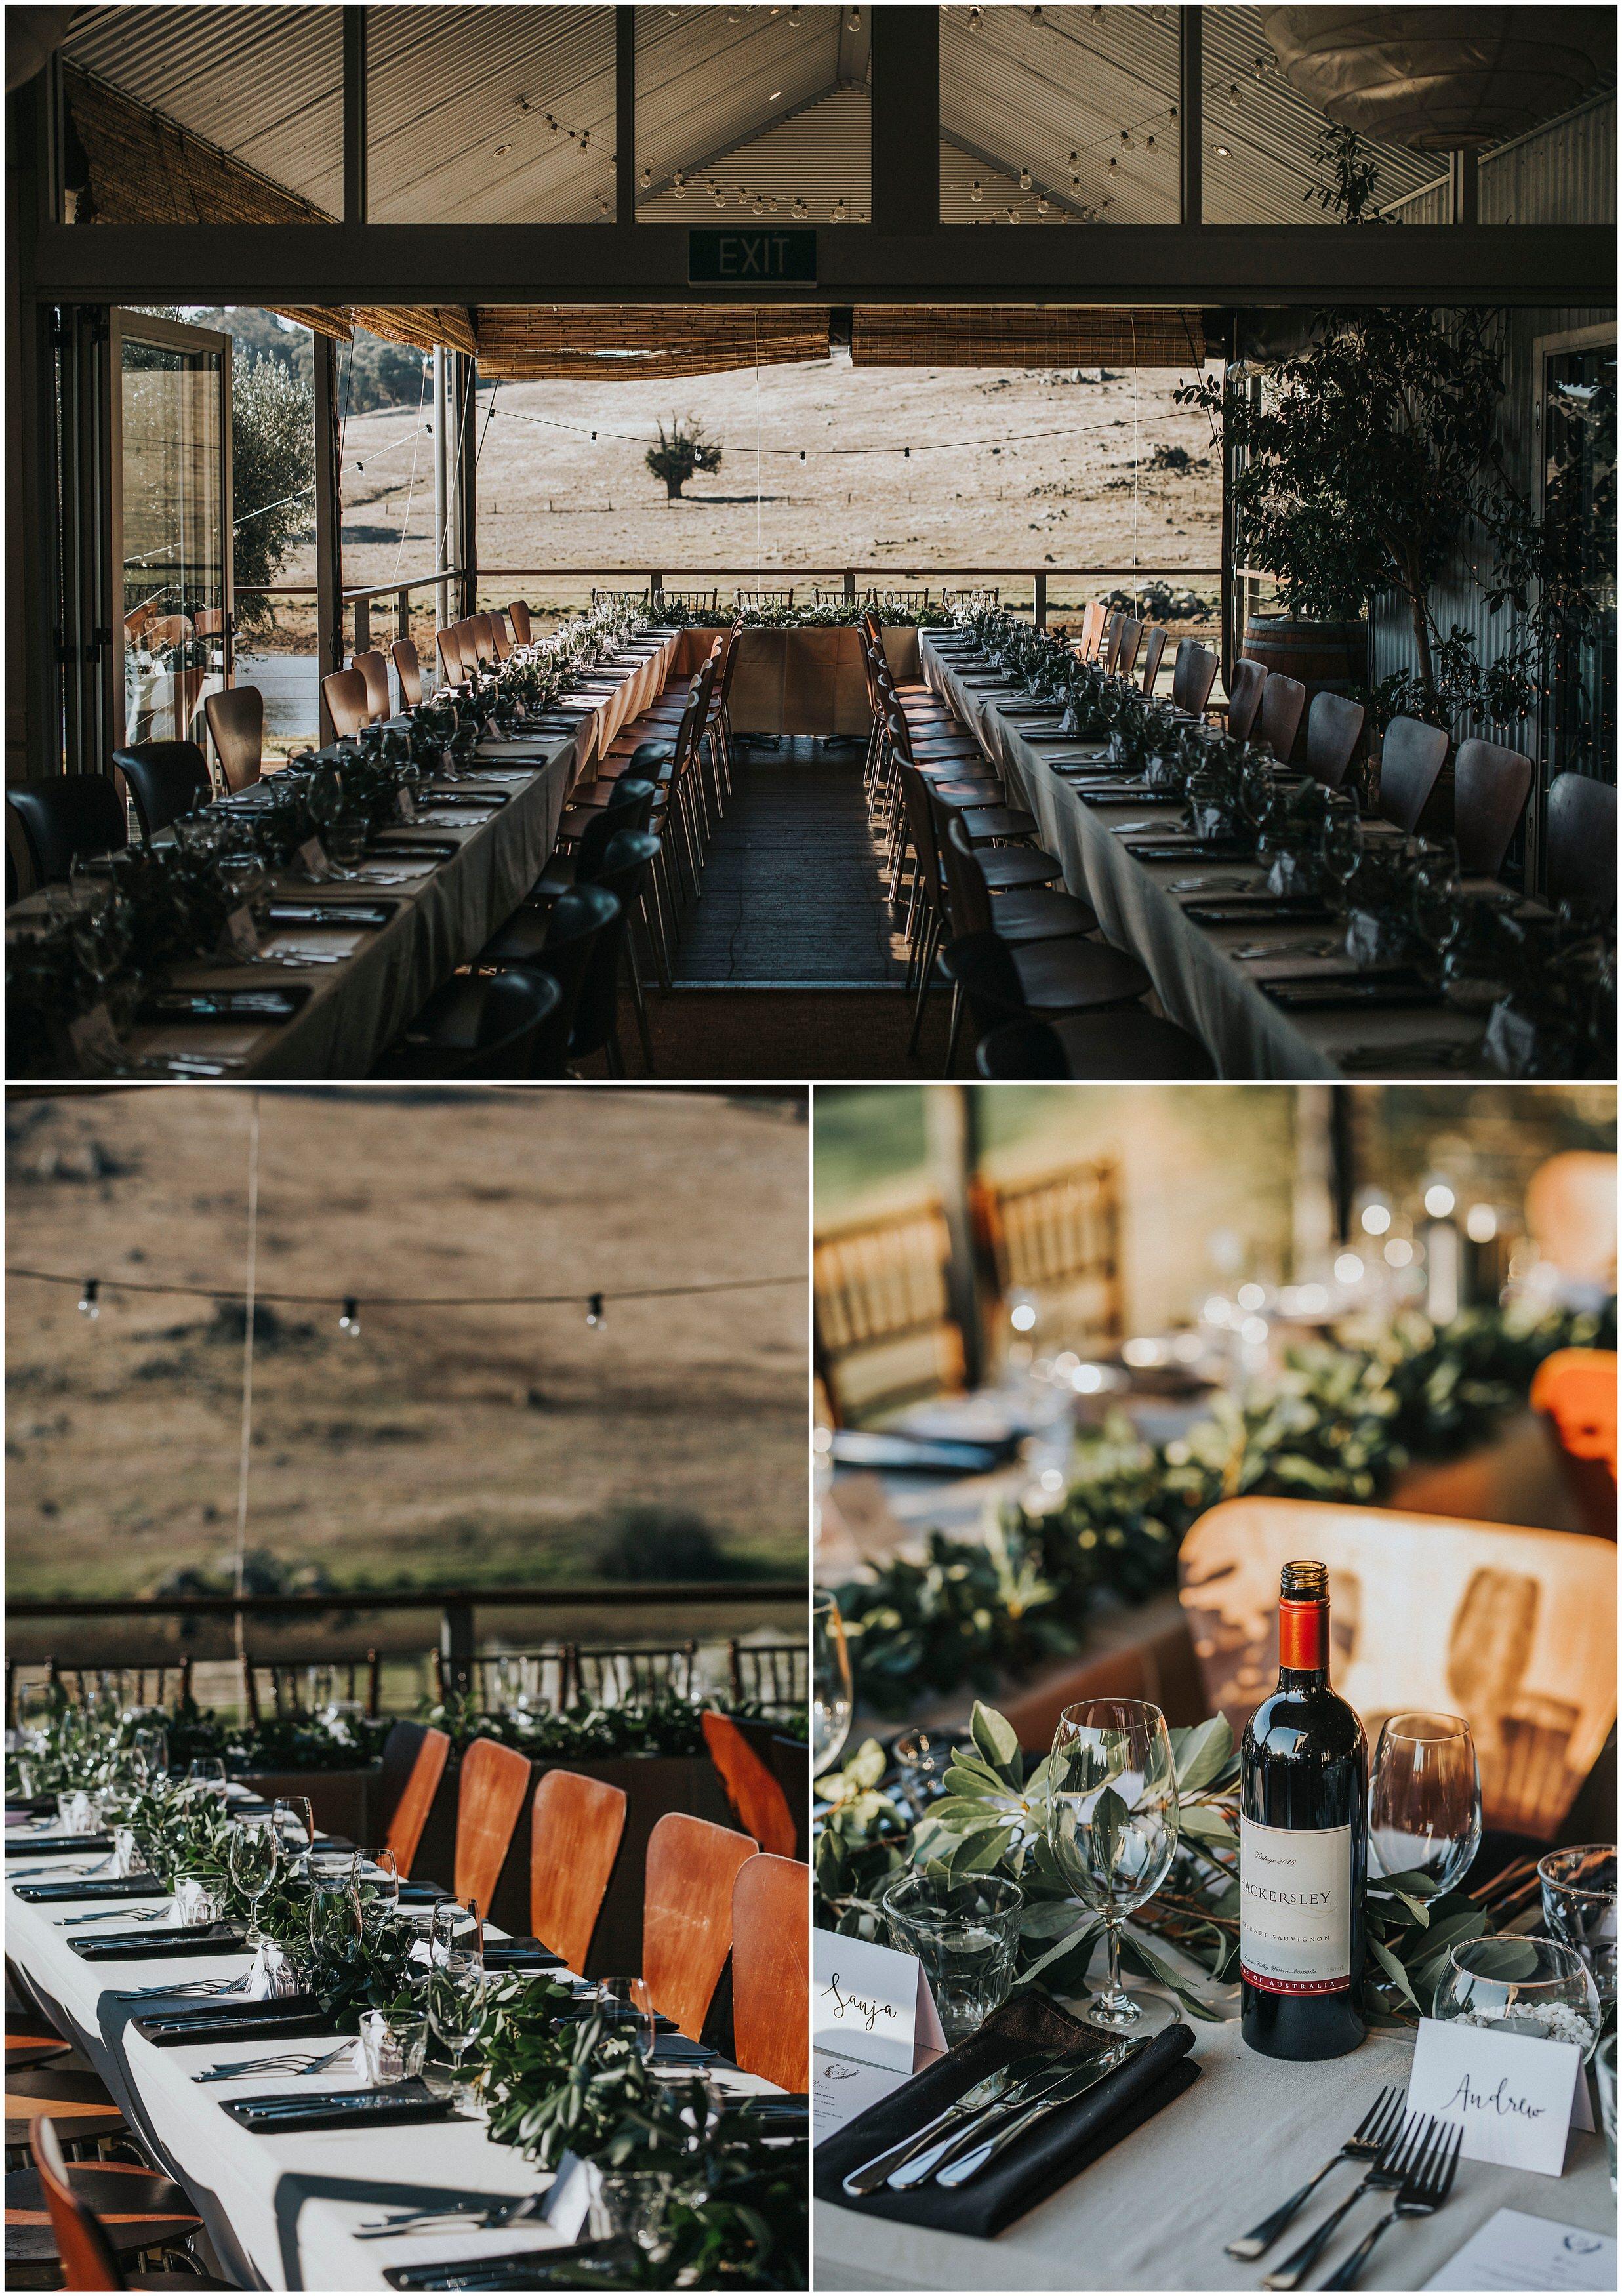 ferguson_valley_perth_wedding_photgorapher_keeper_creative_16.JPG